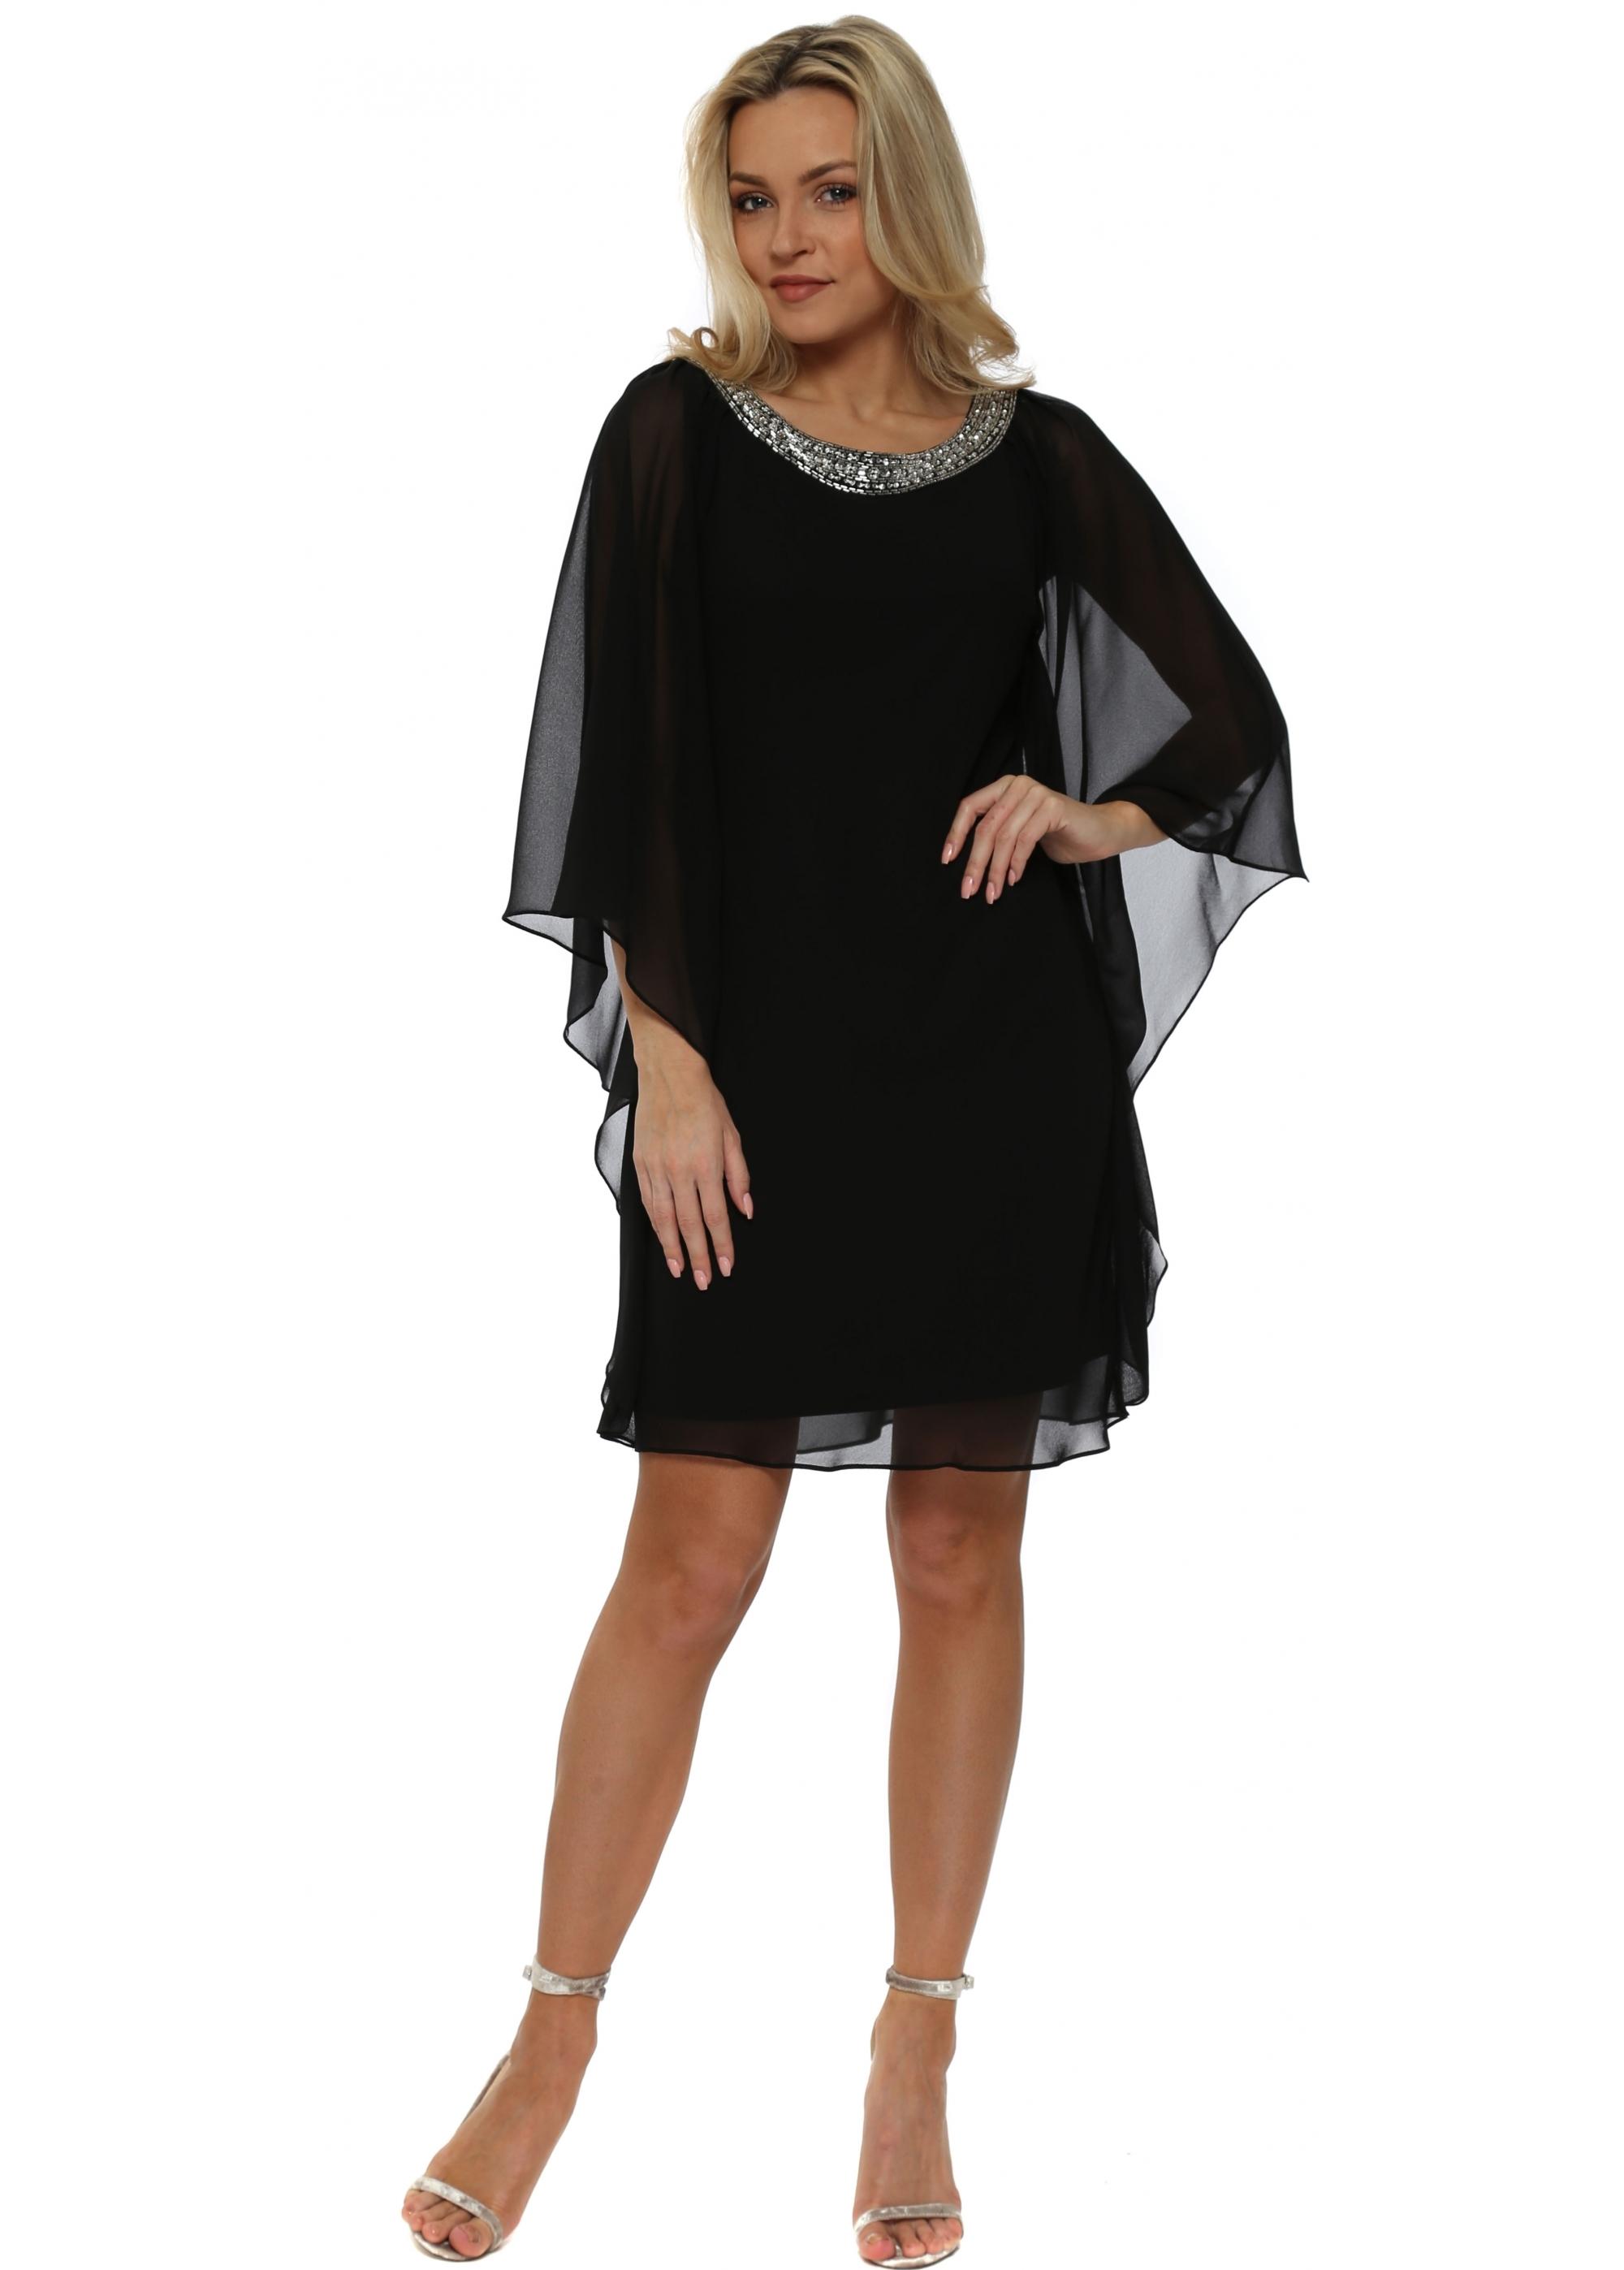 Mascara Black Batwing Dress Mc163005